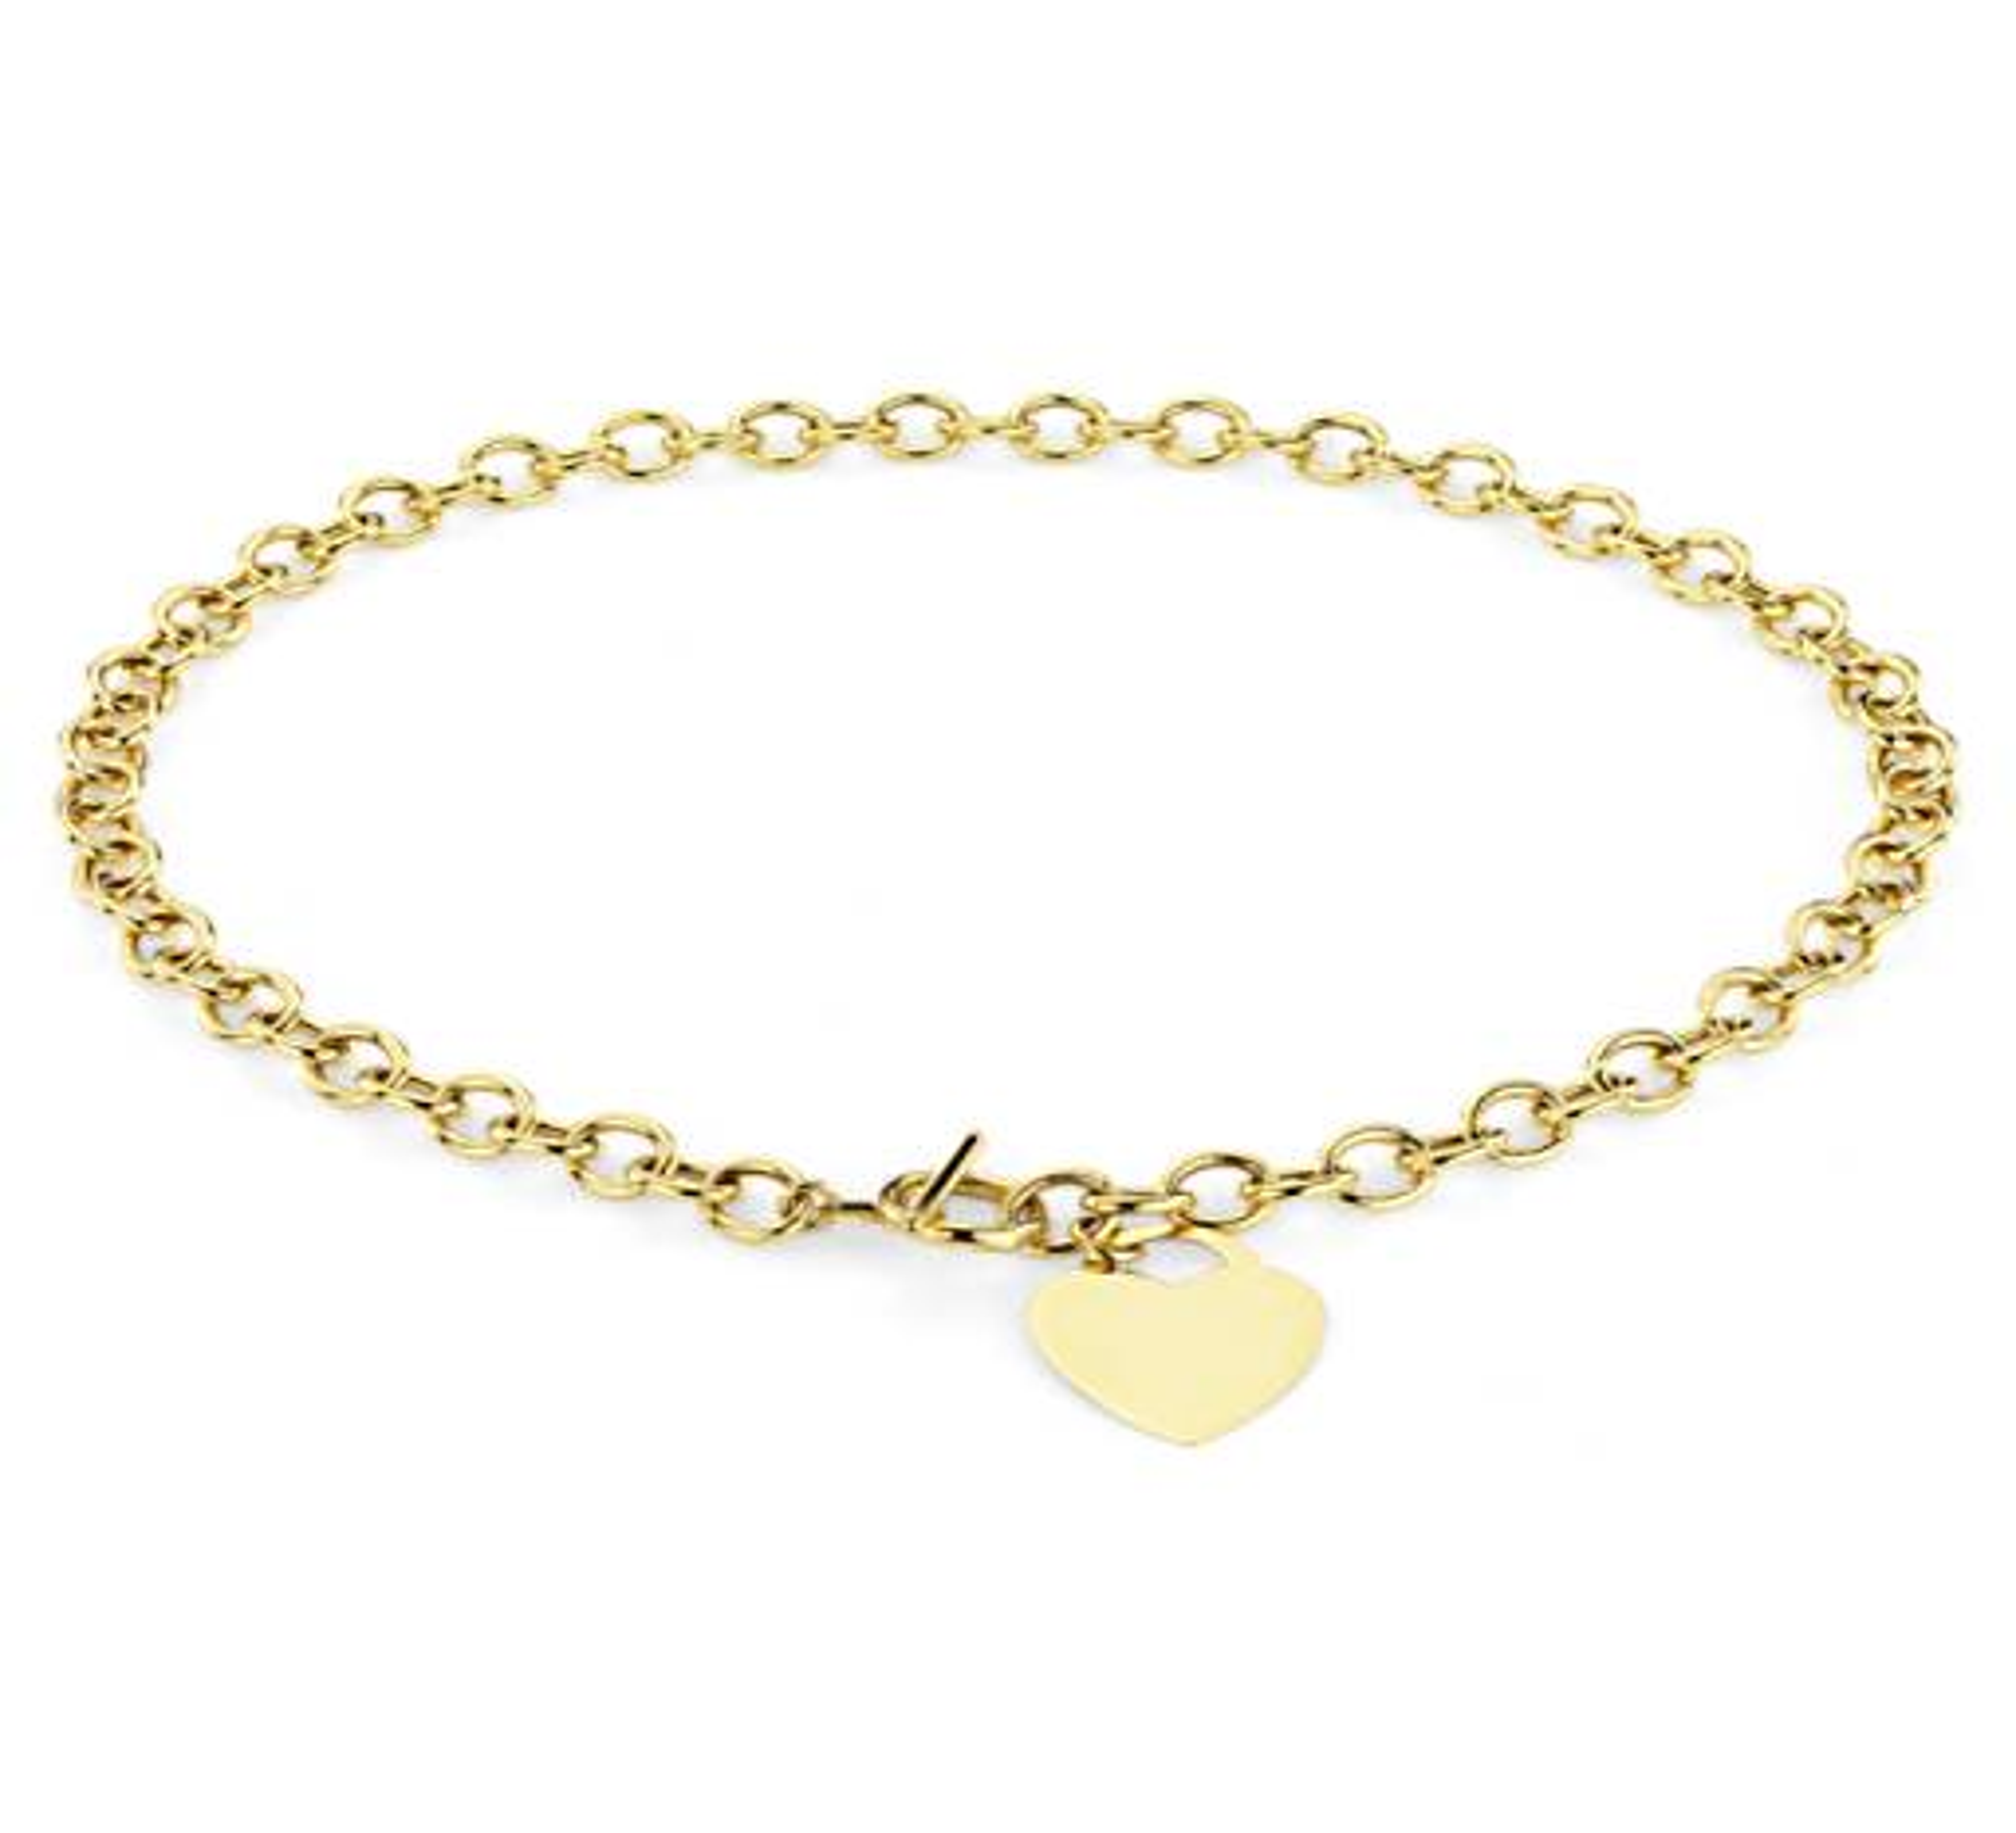 14k 黃金套索心形小牌項鏈